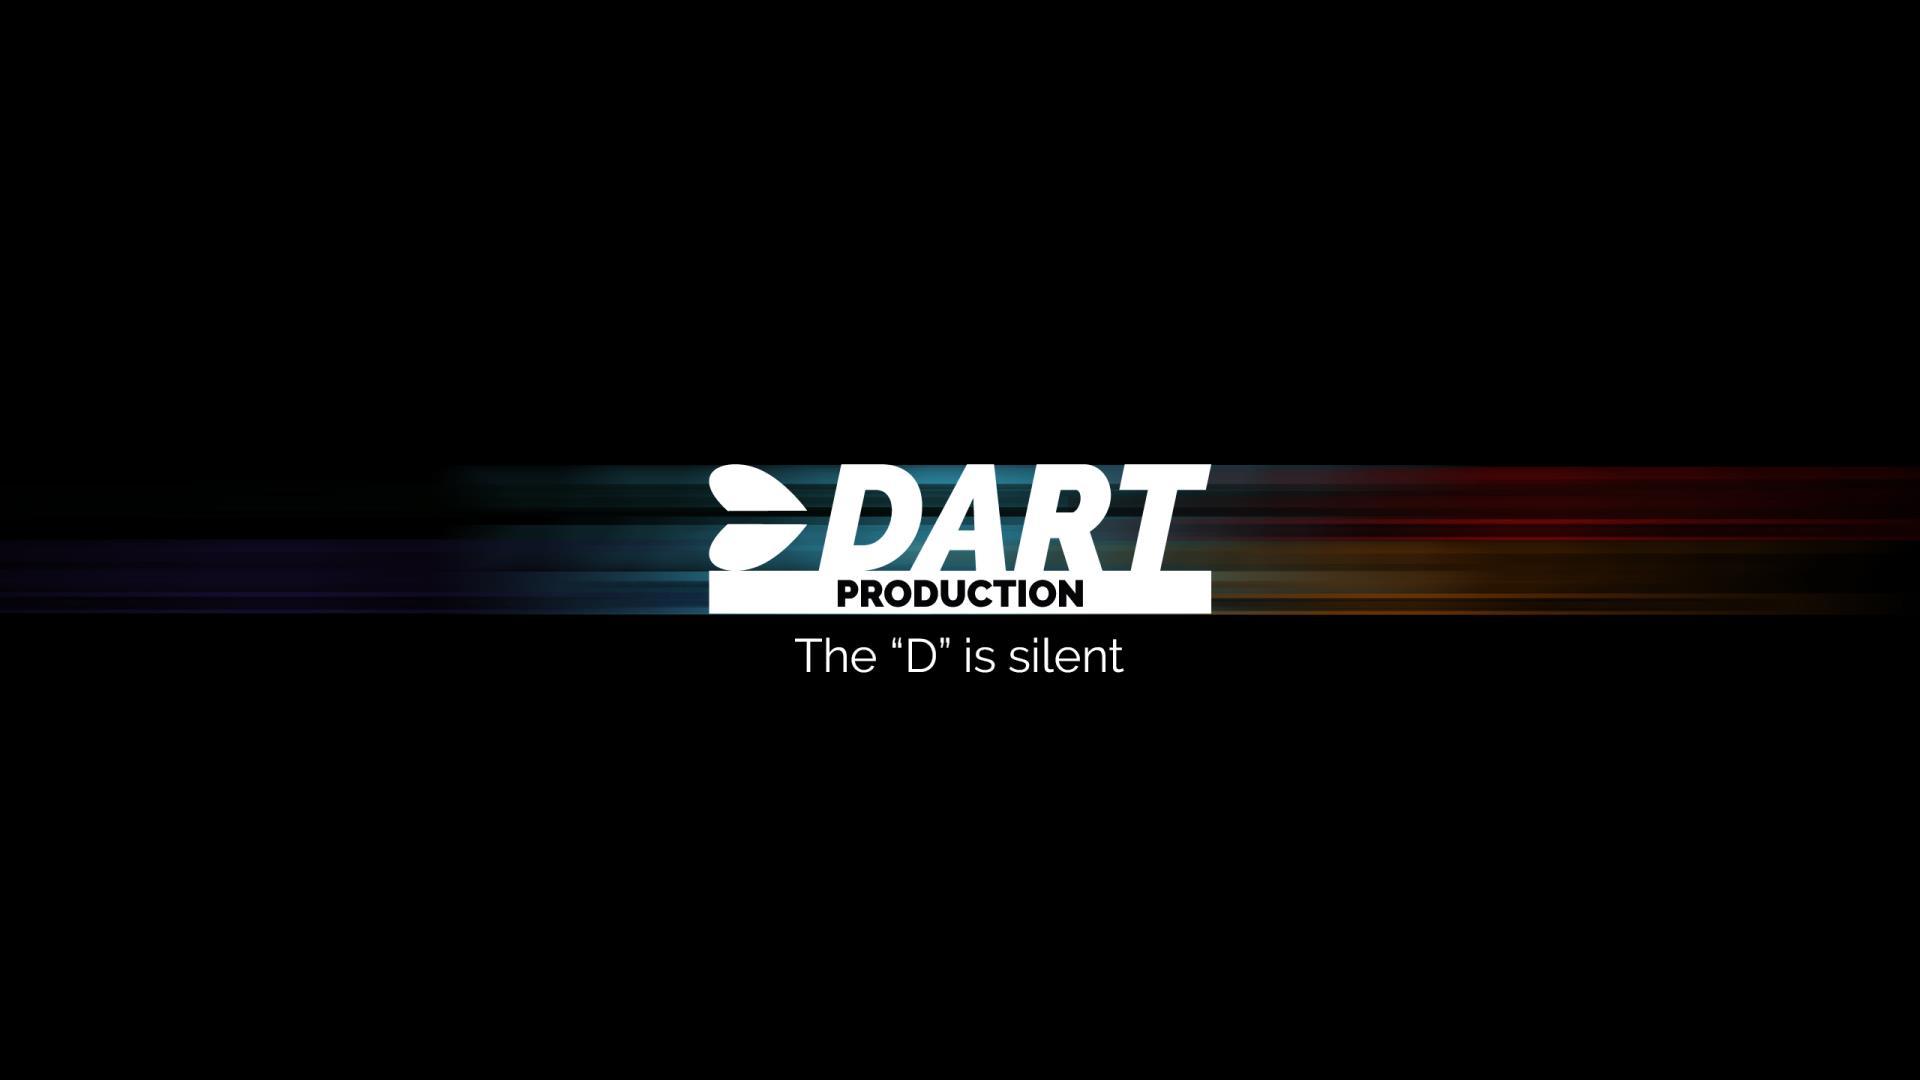 DART Production